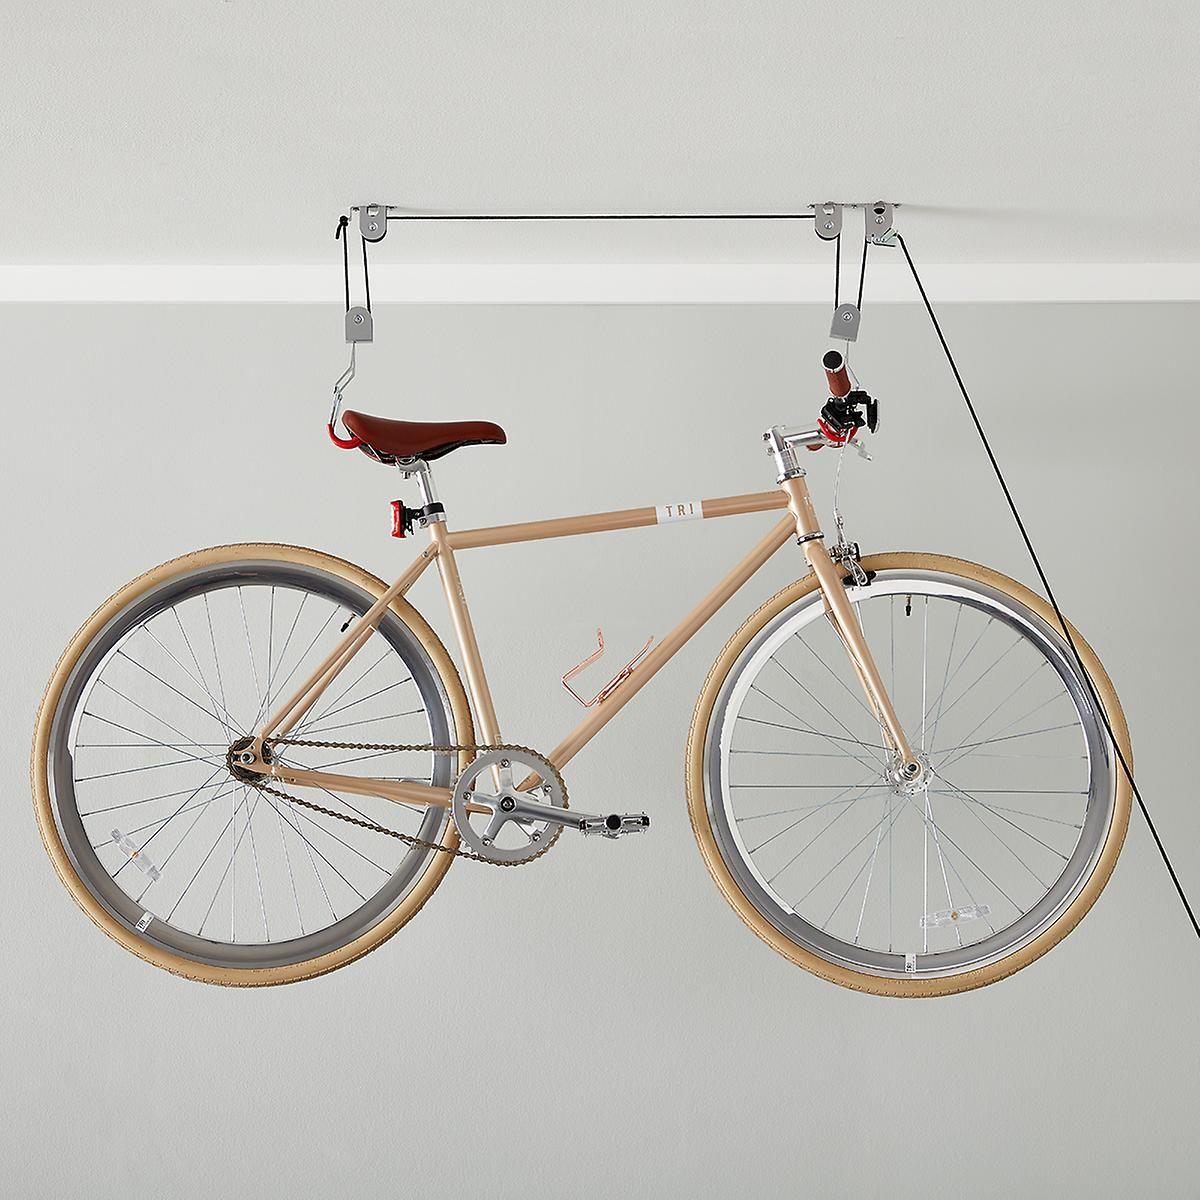 Ceiling Mount Bike Lift Bike Storage Apartment Bike Lift Indoor Bike Storage